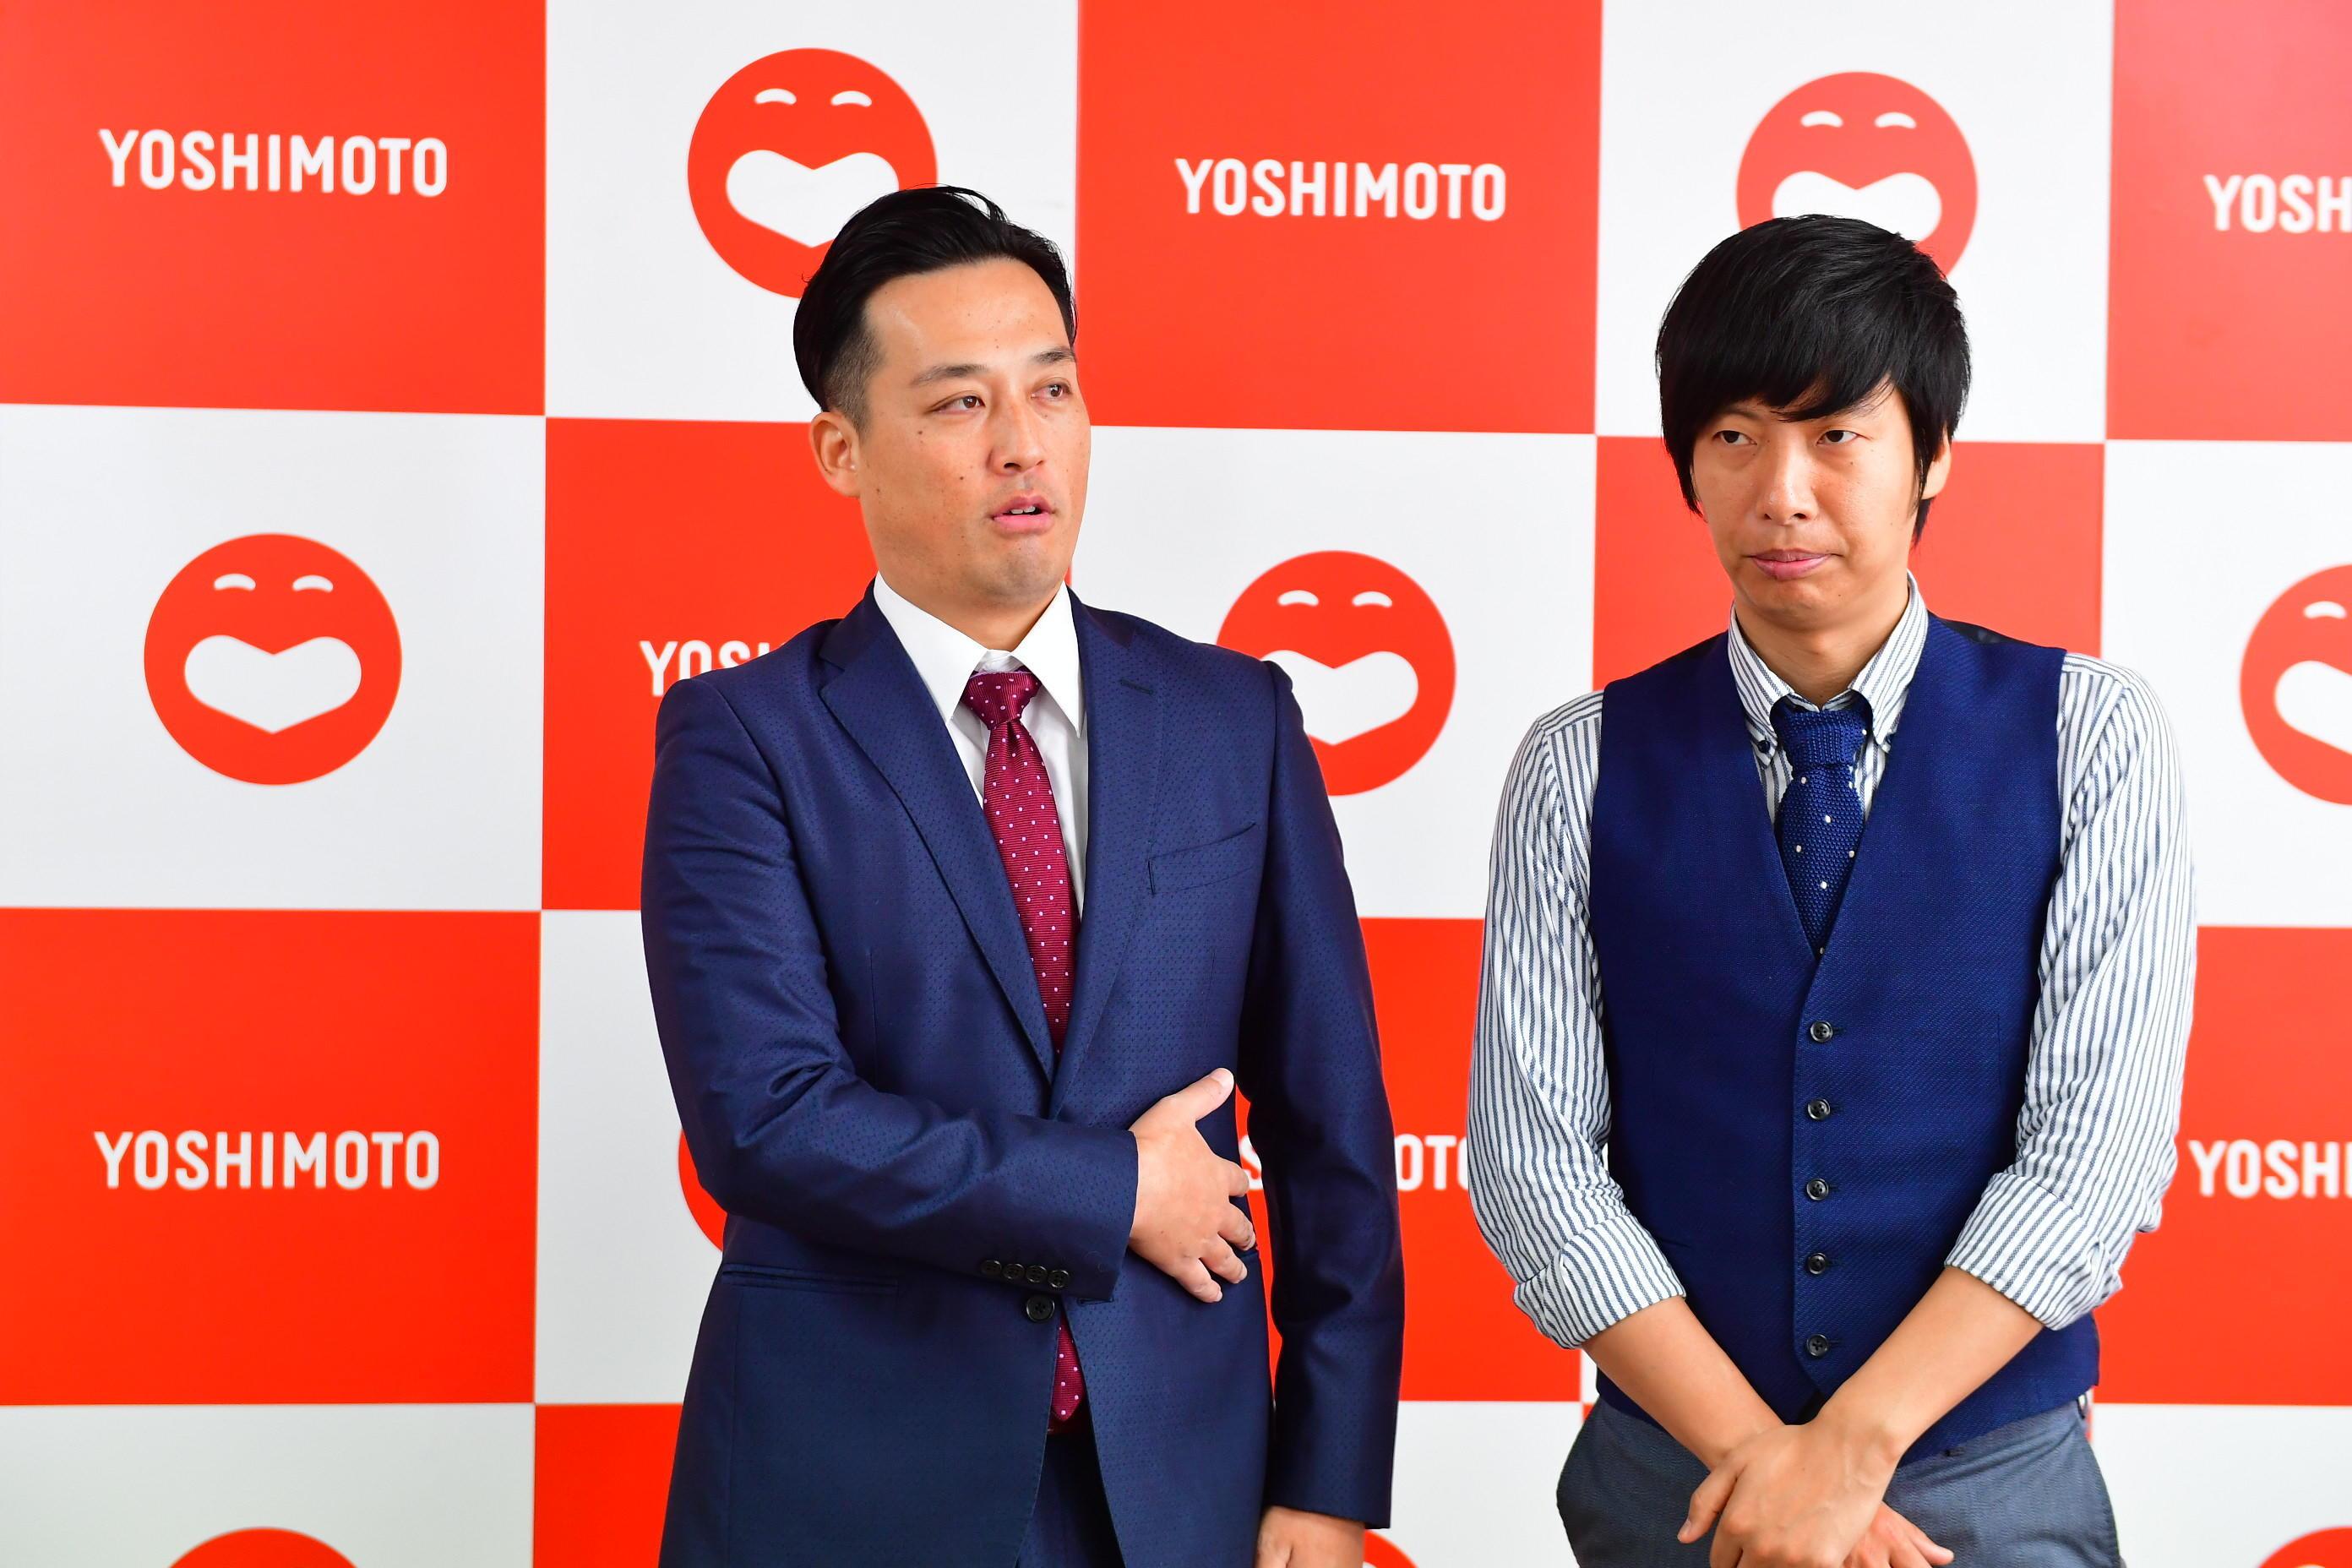 http://news.yoshimoto.co.jp/20171227162601-ddf012845fdc7cb6b9ae7e235bf47536dcb5e3ff.jpg